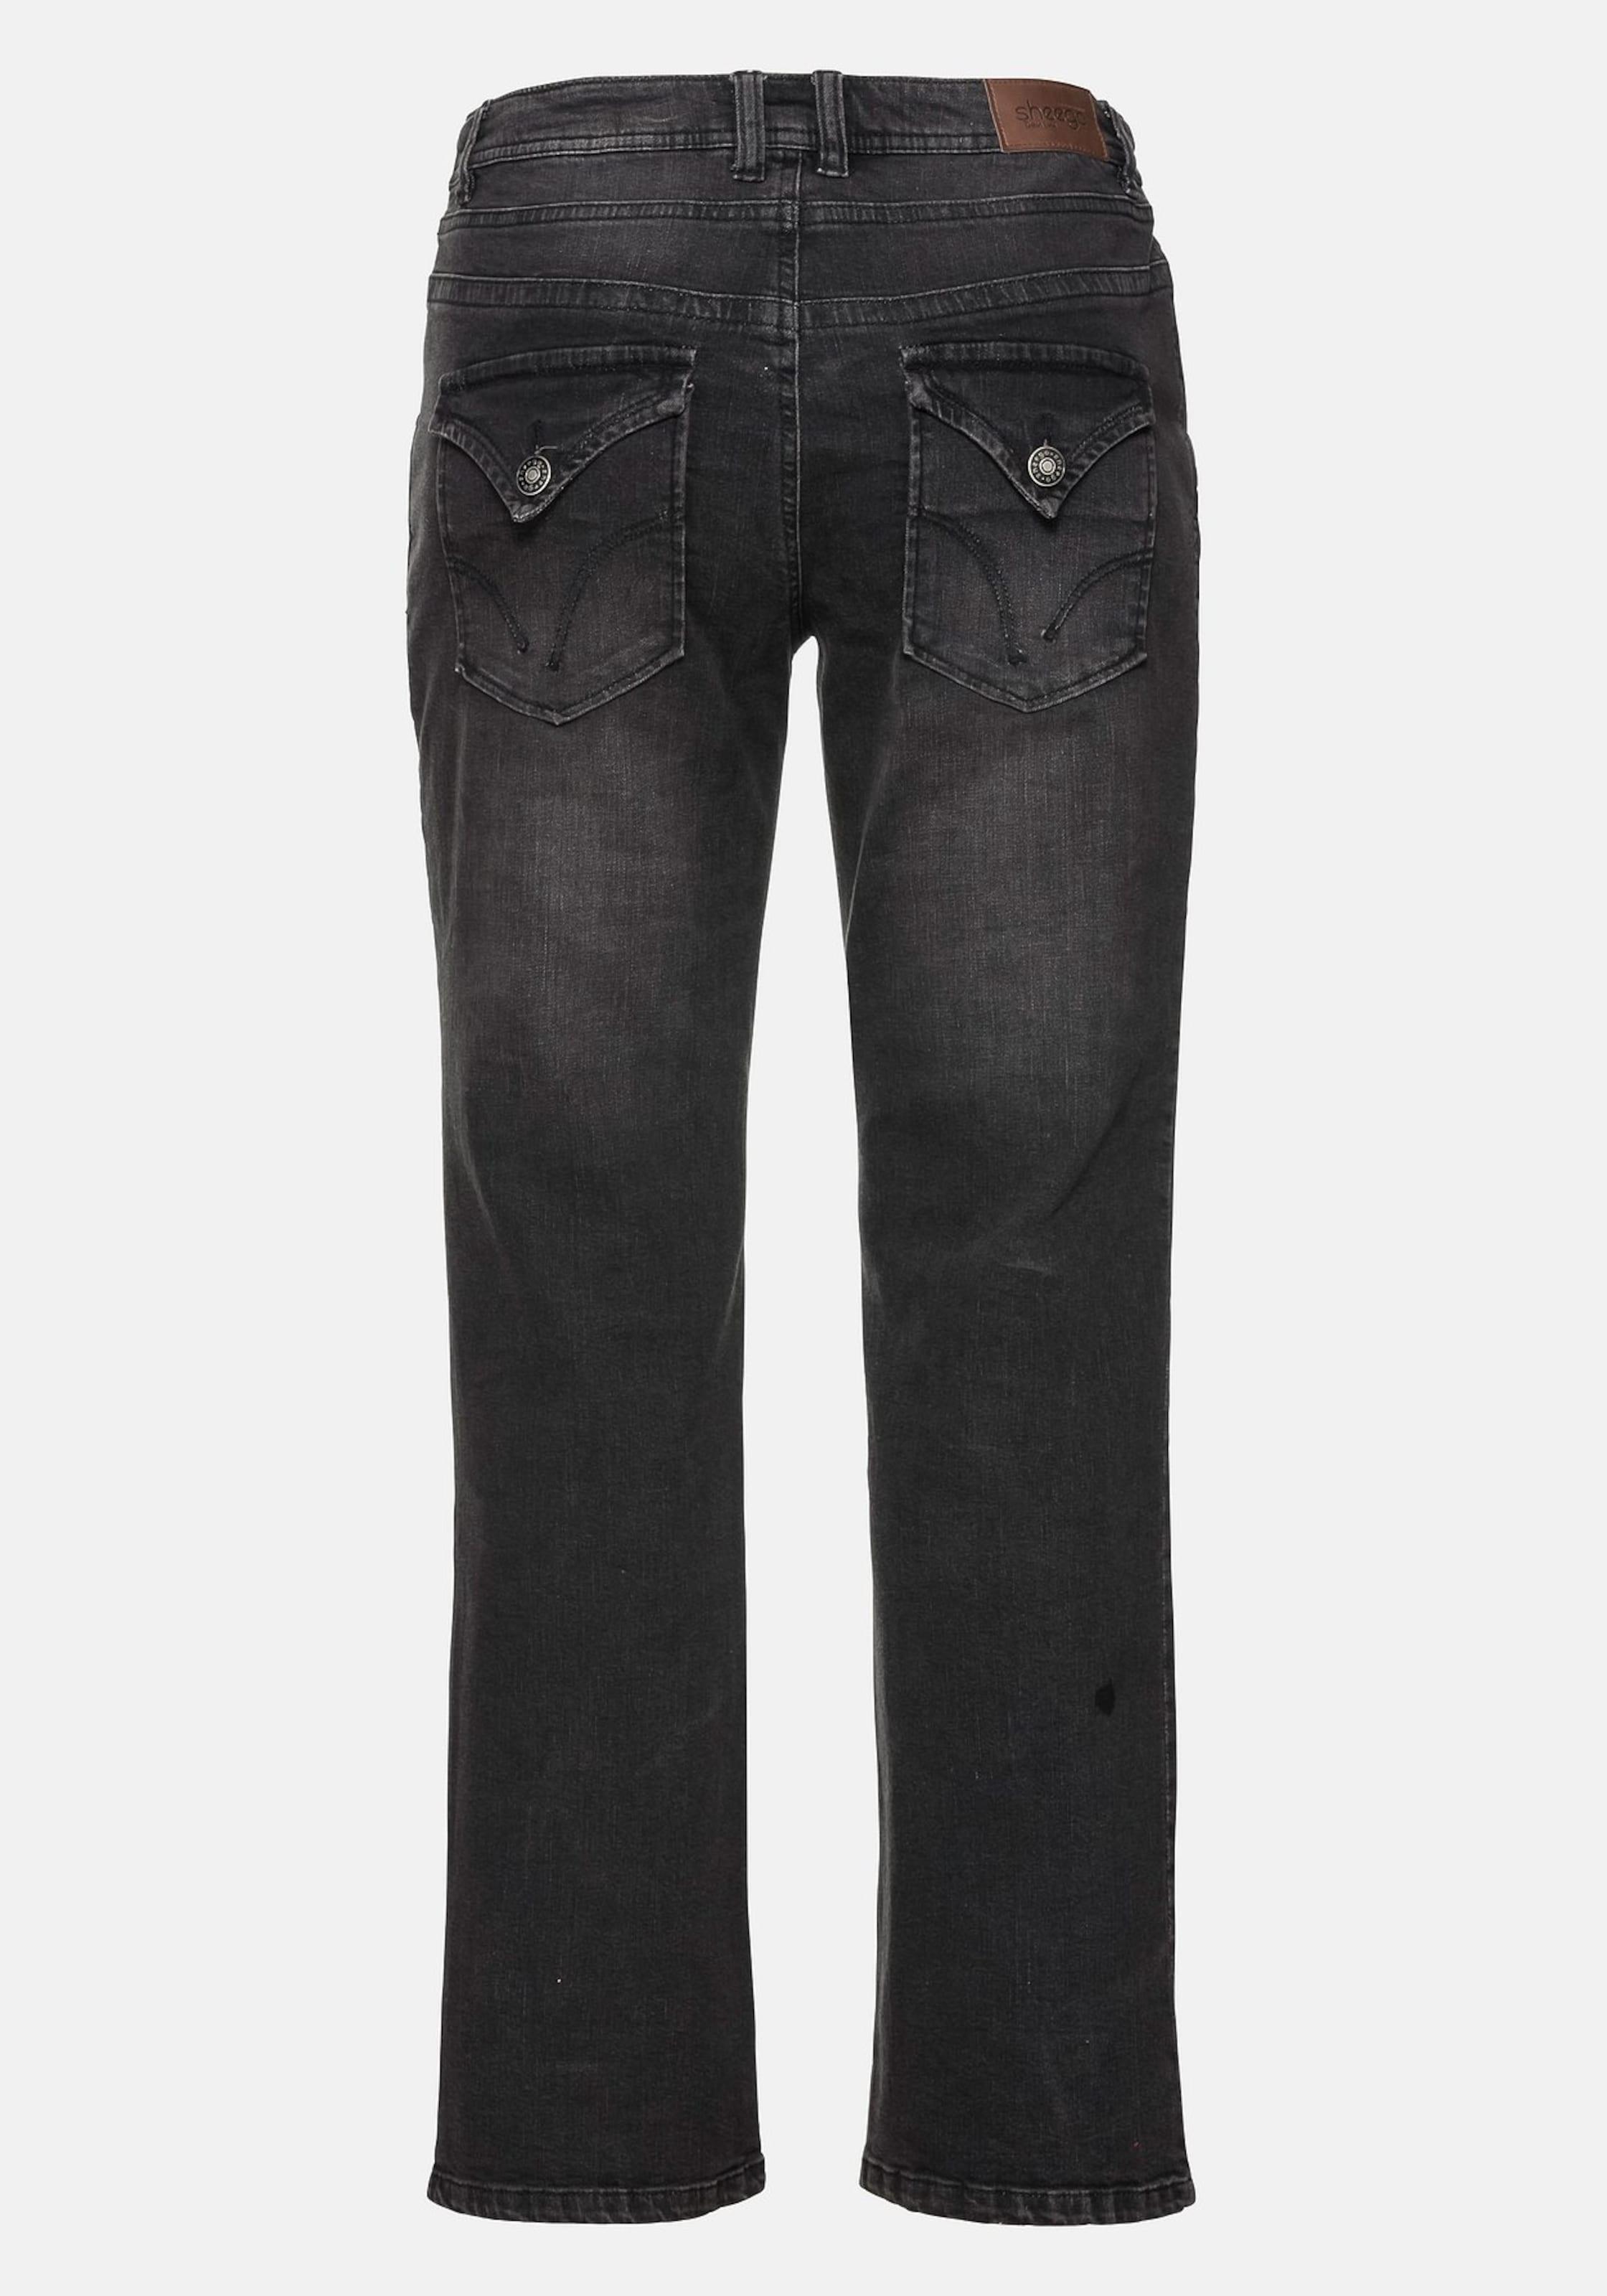 Denim Jeans In Sheego Black Black Jeans In Sheego FTlcK1J